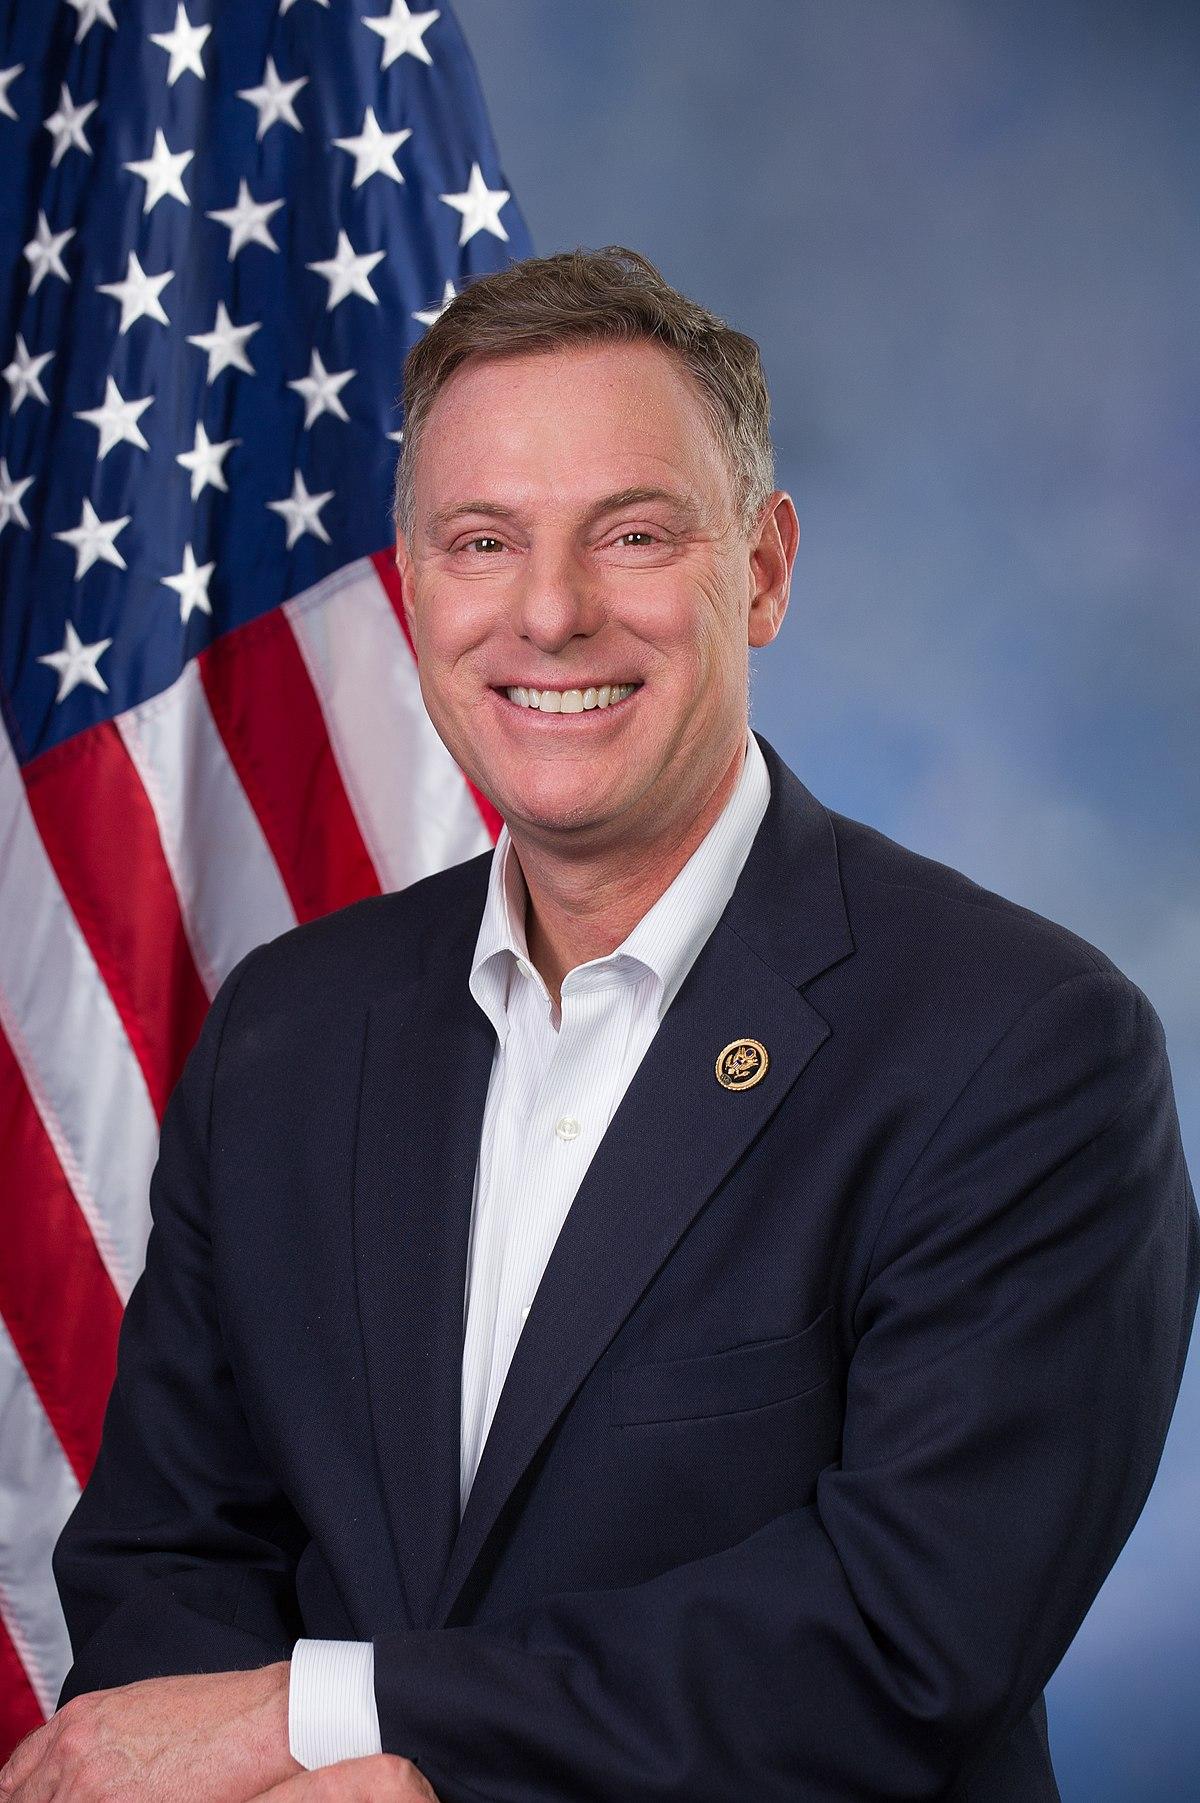 Scott Peters (politician) - Wikipedia